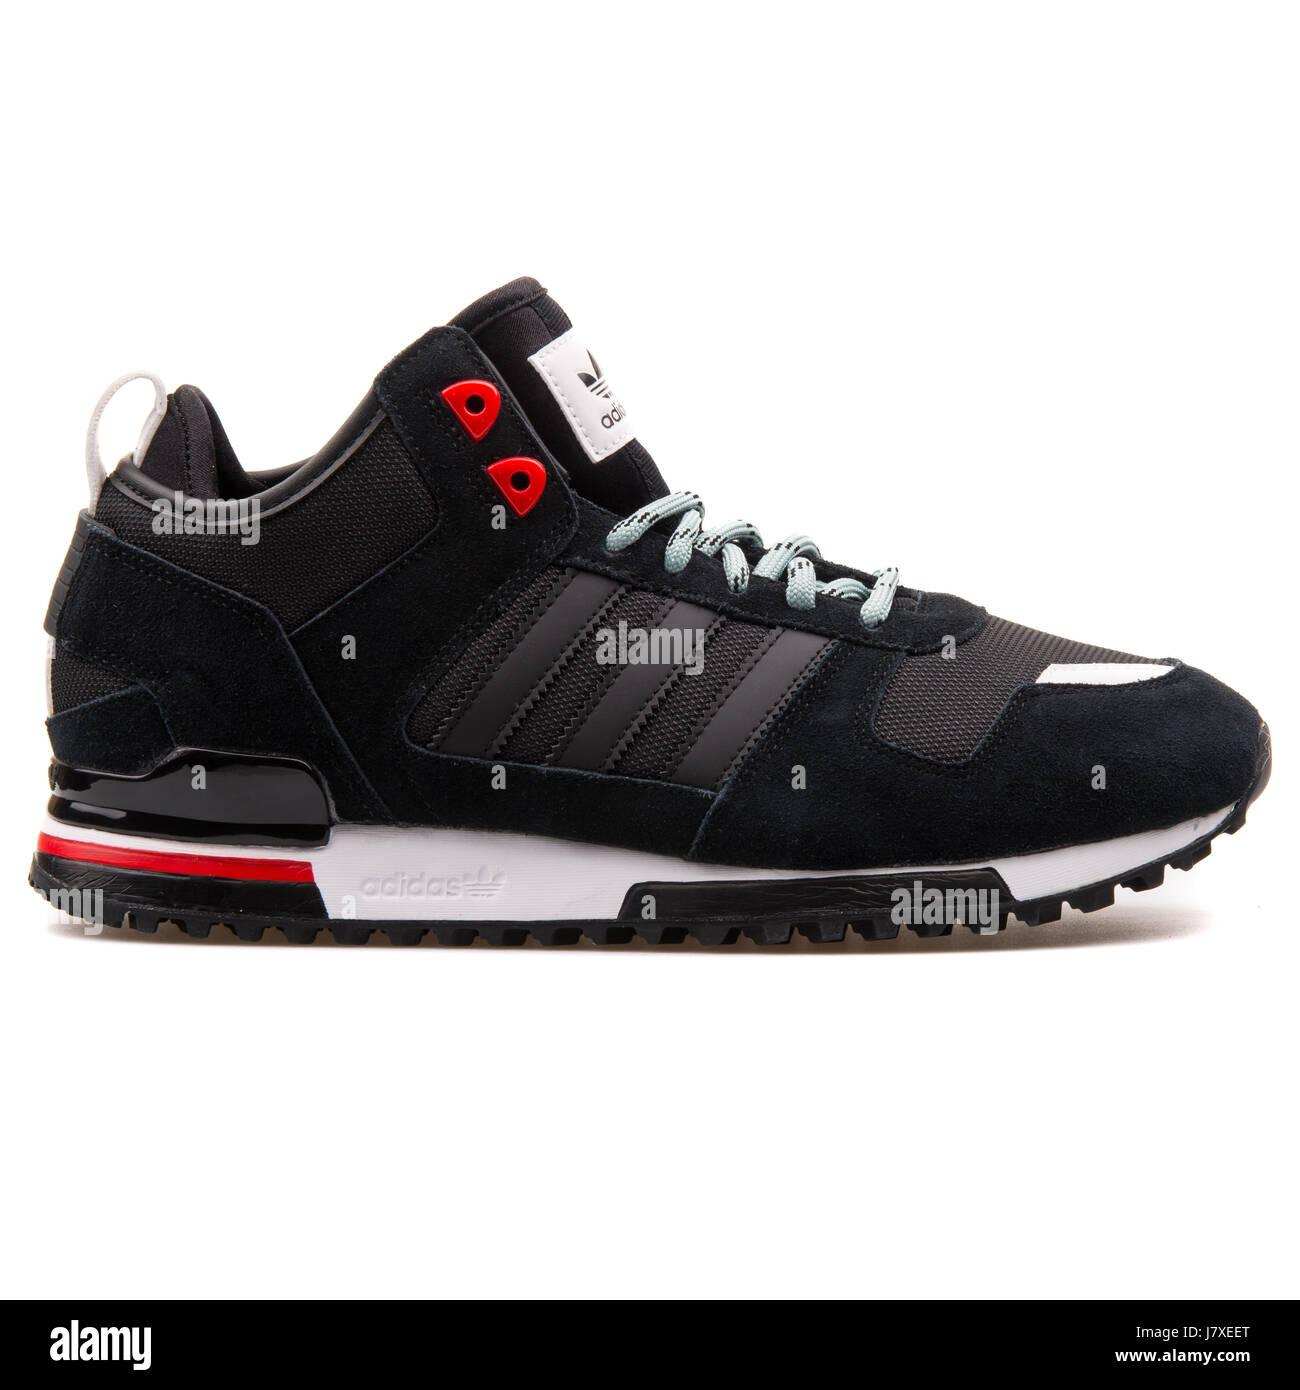 Adidas ZX700 Winter Men's Black Sneakers B35236 Stock